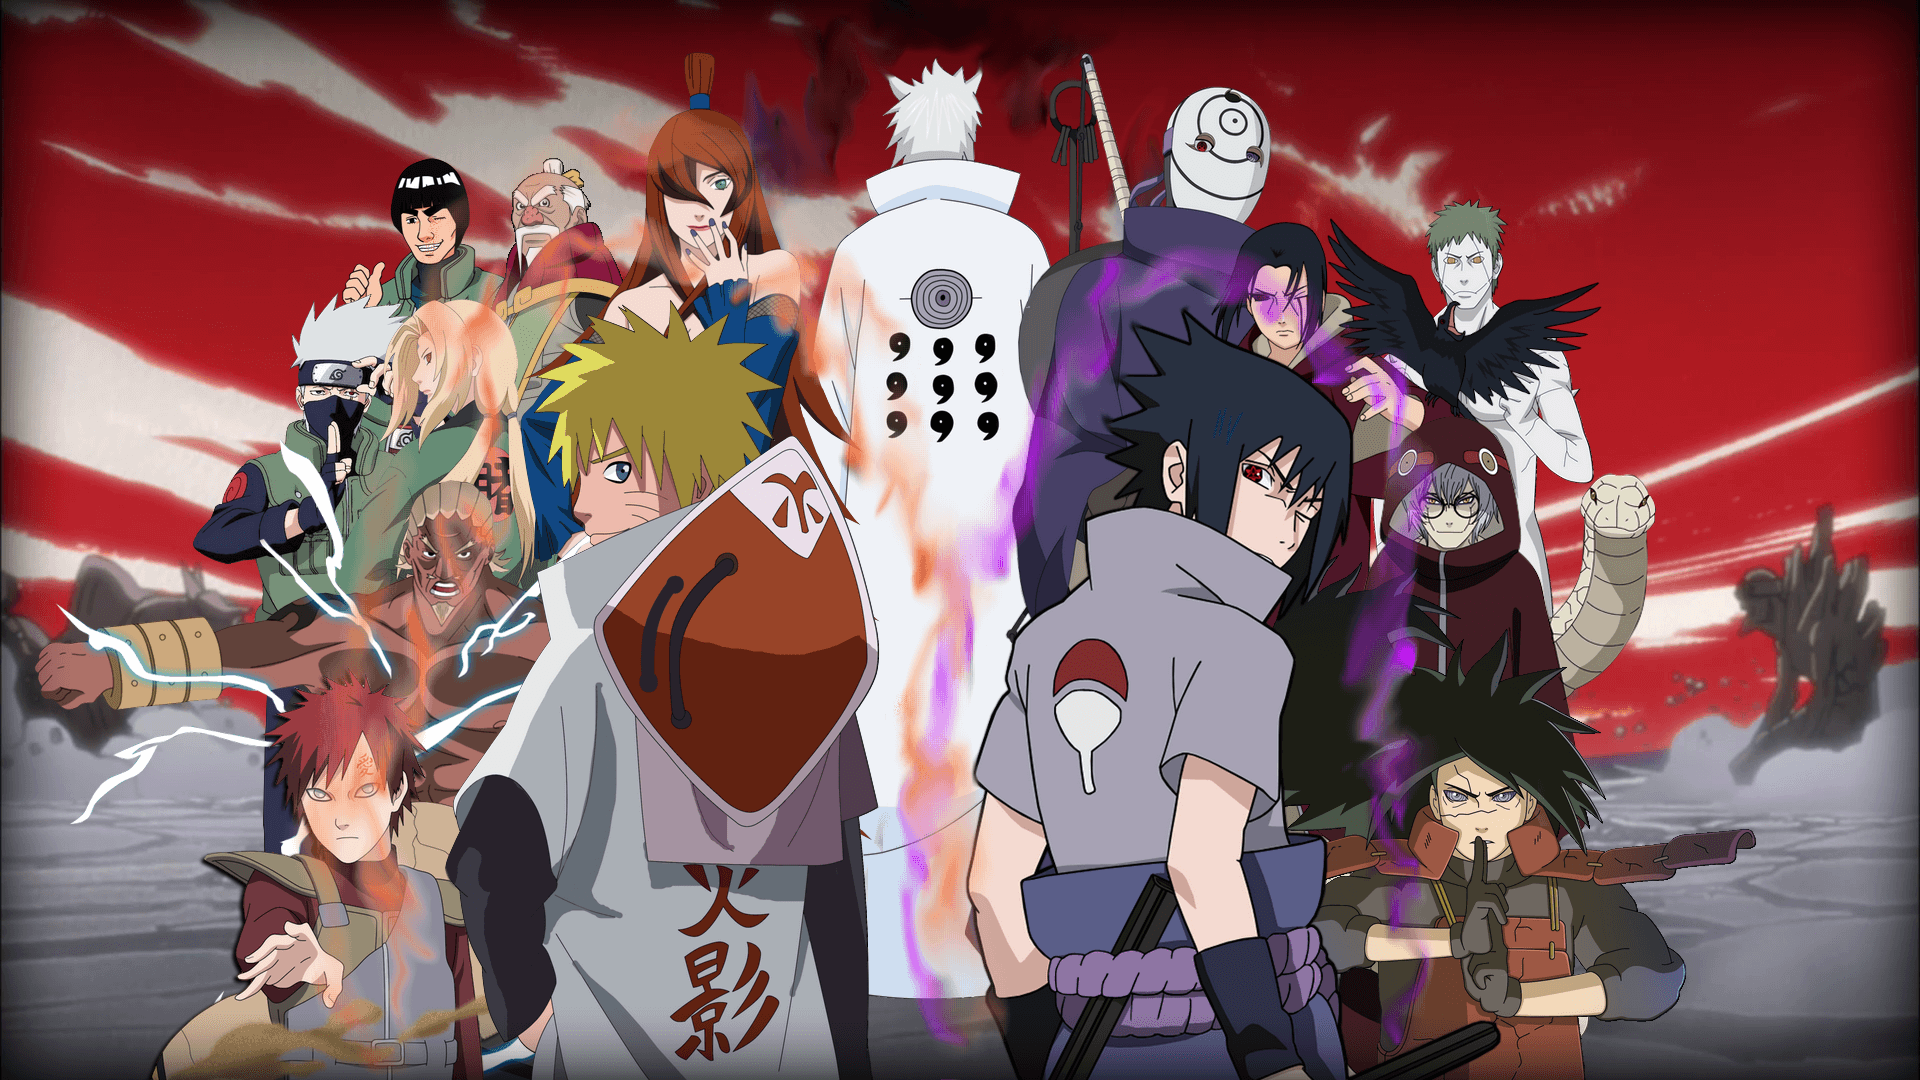 Naruto wallpapers hd 2016 wallpaper cave - Anime war wallpaper ...